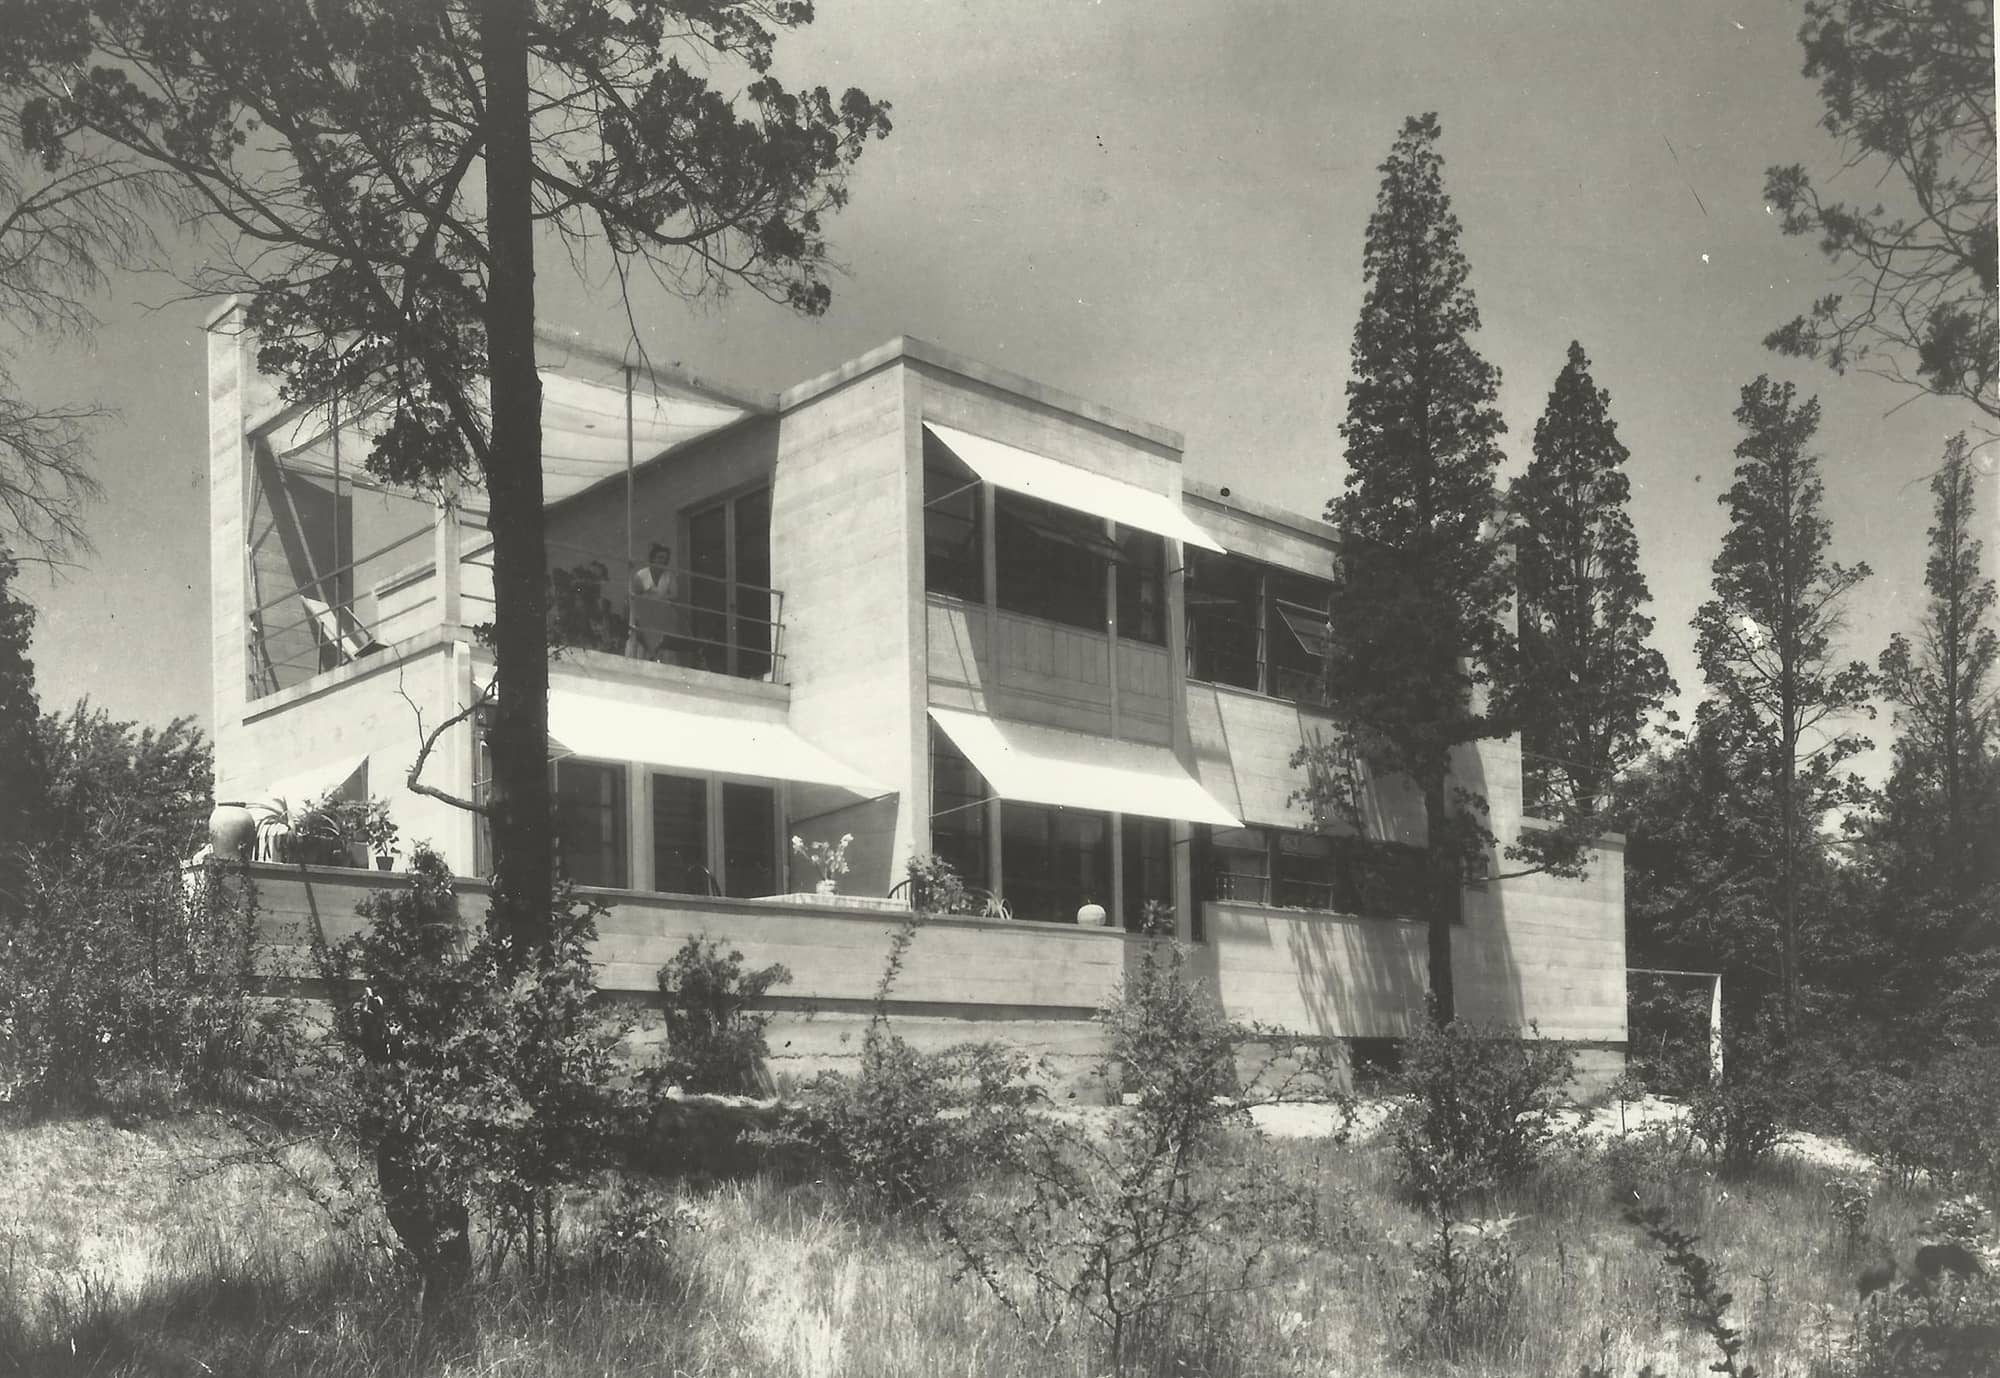 Eleanor Raymond | Pioneering Women of American Architecture on elizabeth homes plans, ryan homes plans, jordan homes plans, victoria homes plans,